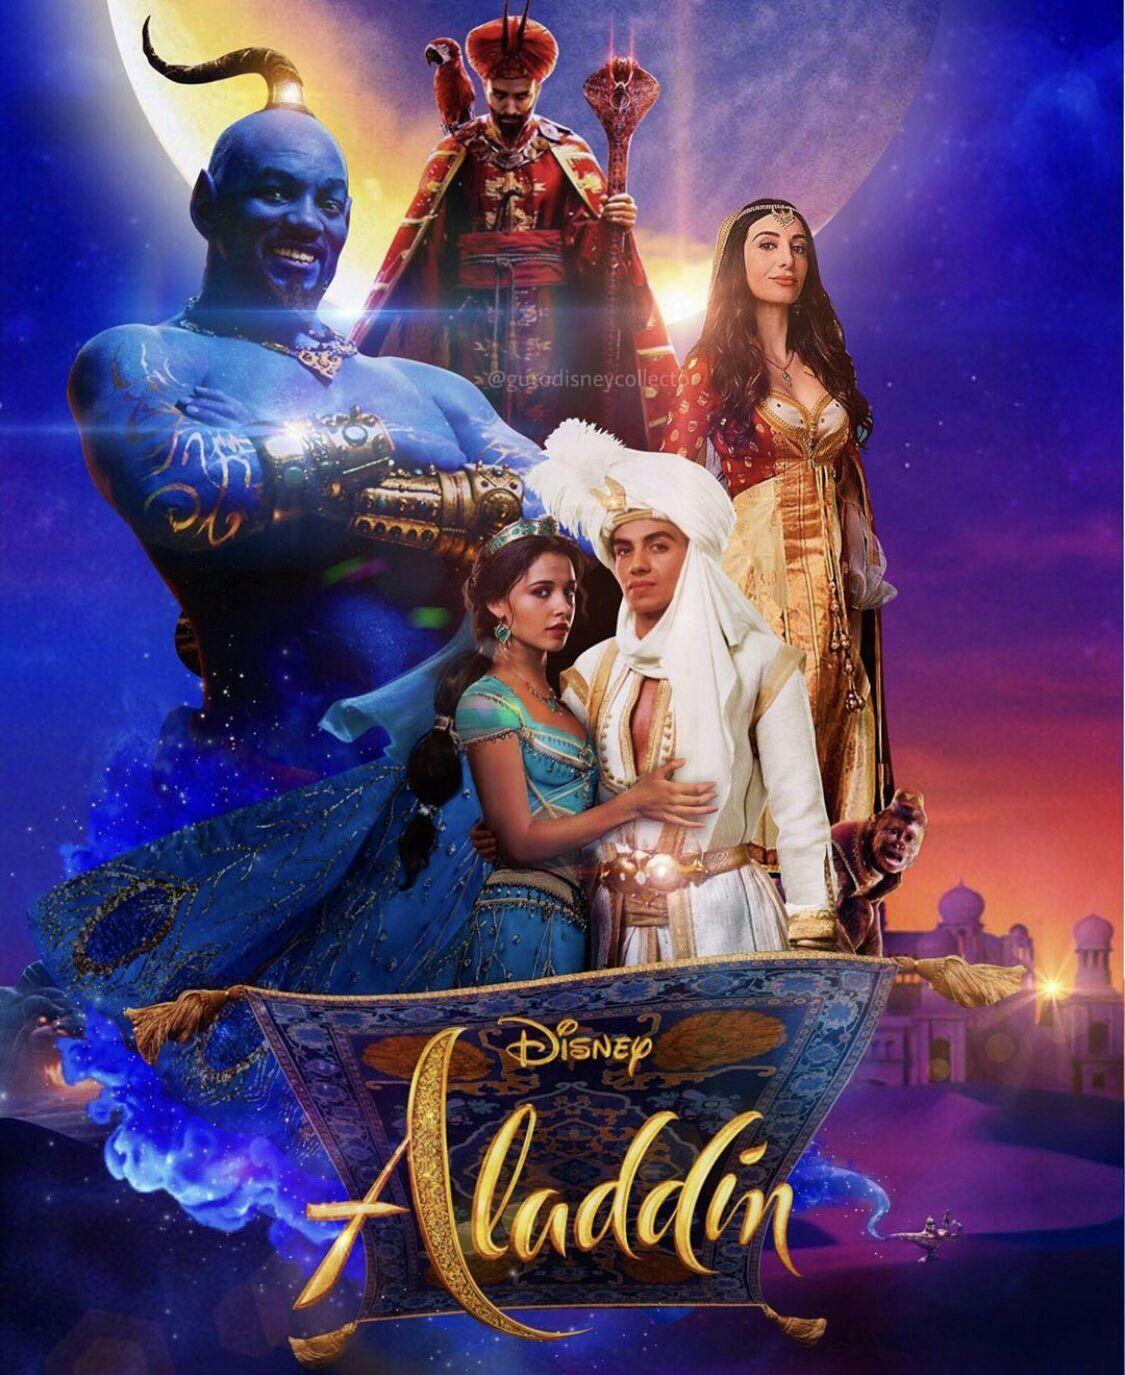 Pin By Marianyeli On Disney Aladdin Full Movie Aladdin Movie Aladdin Film